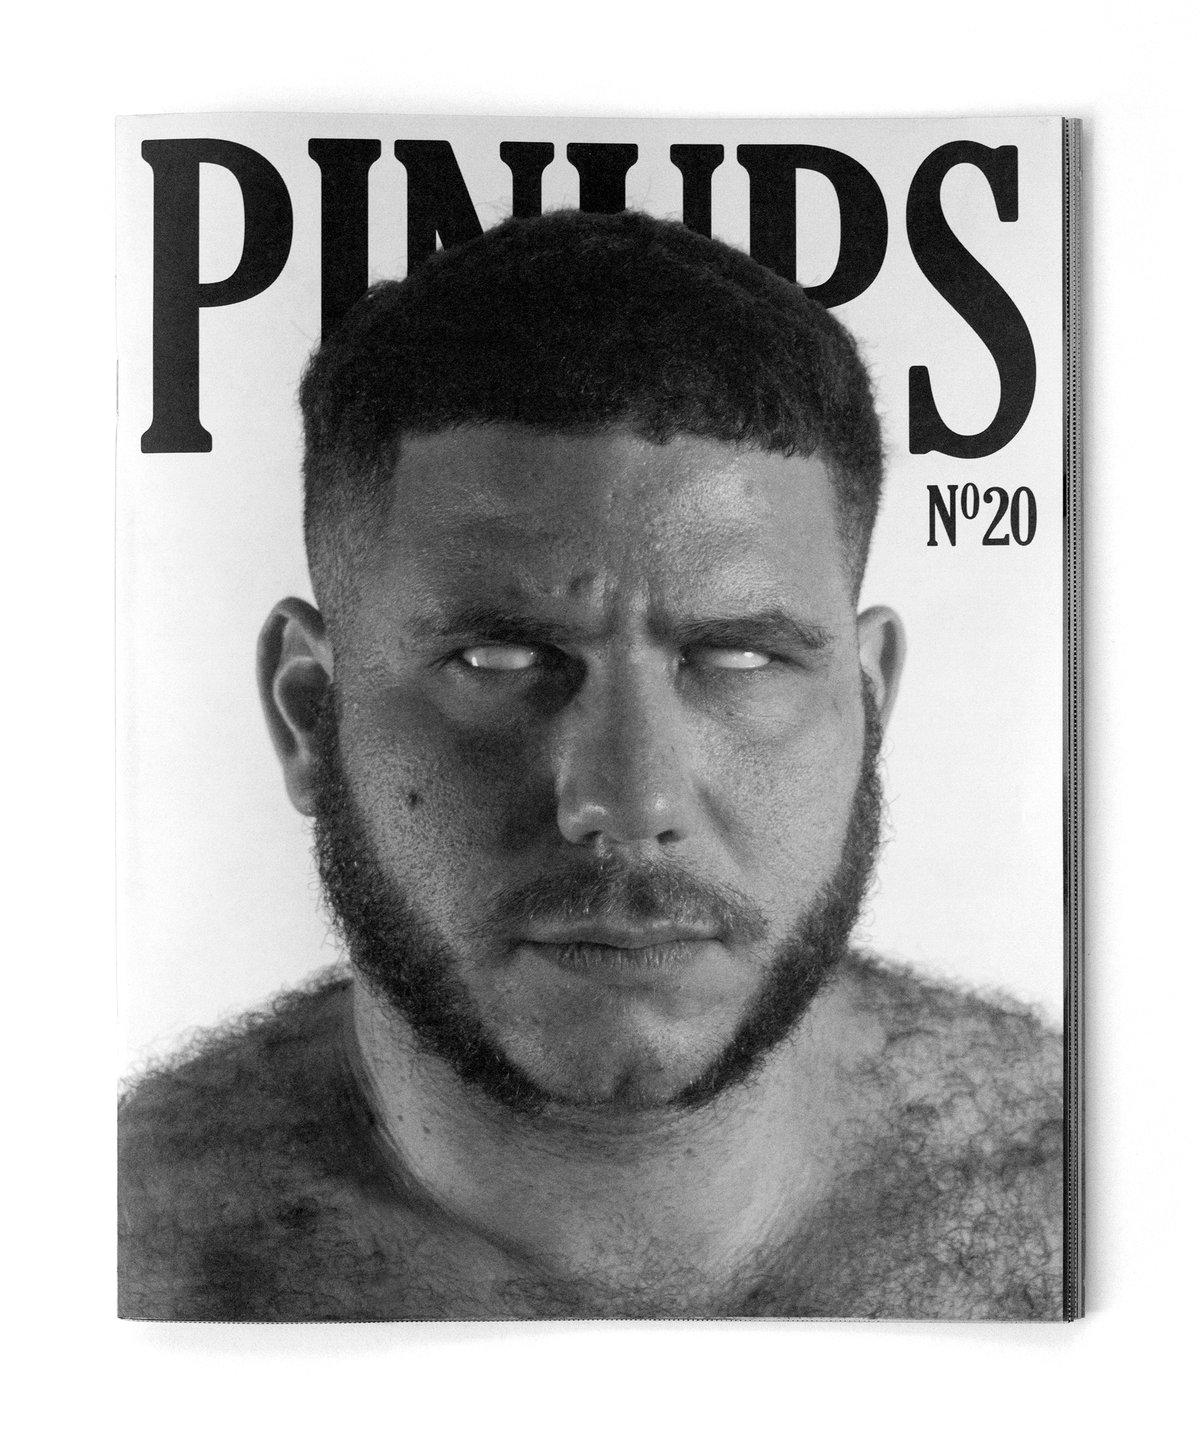 Image of Pinups Nº20